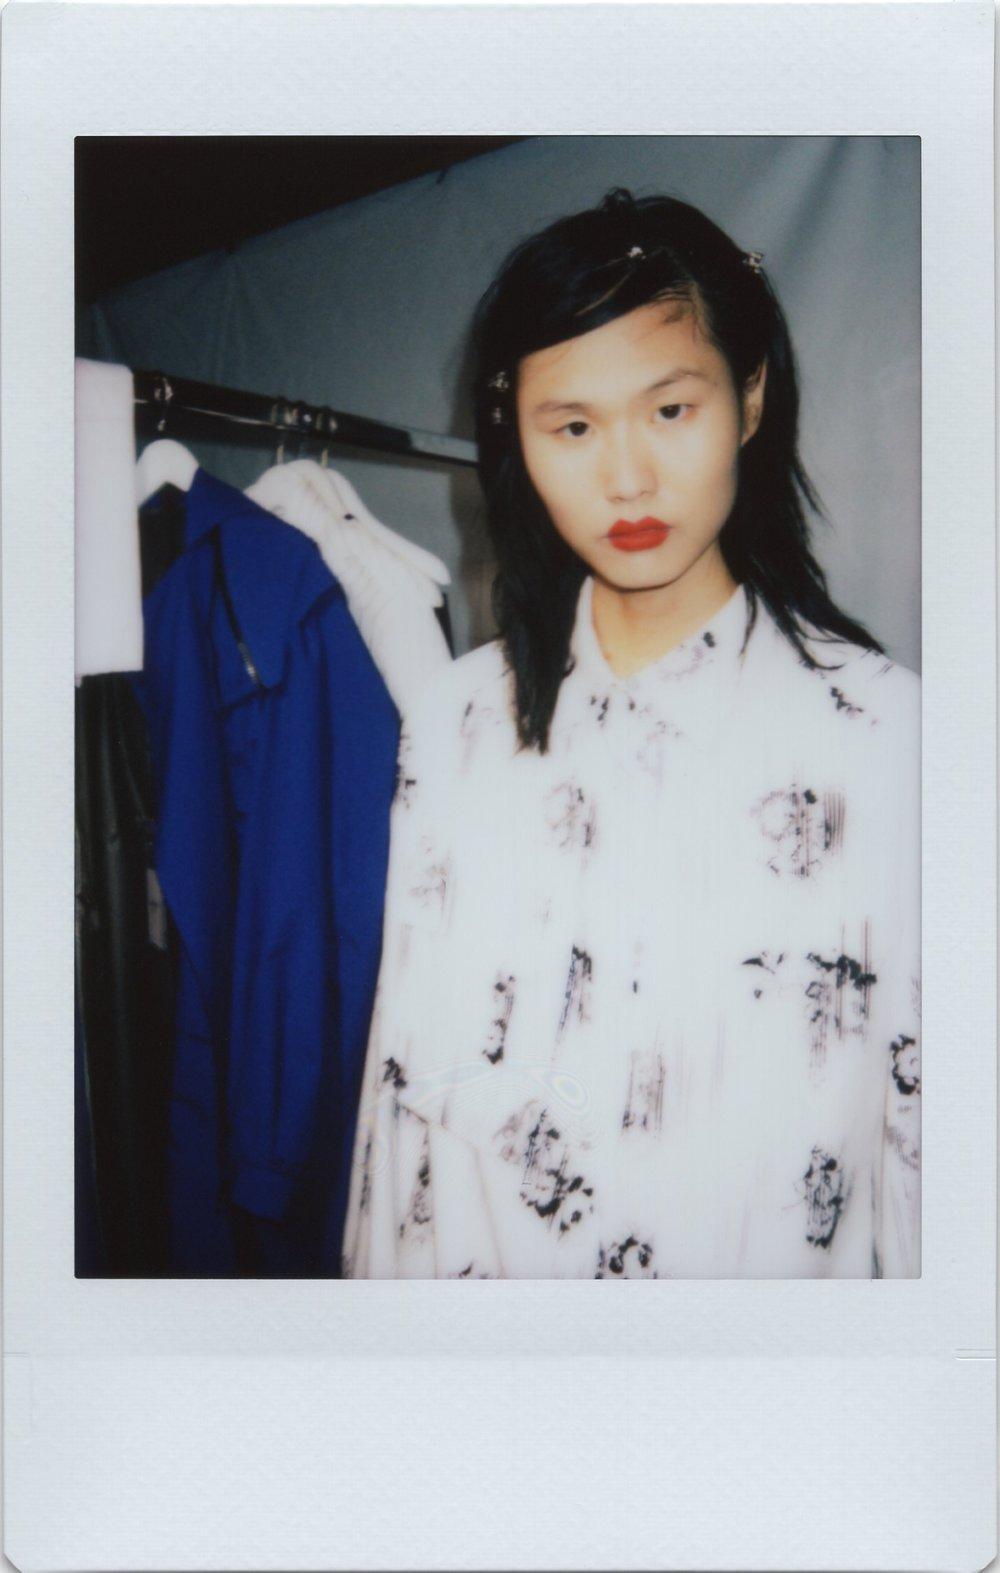 Mashama_Honigschreck_Backstage_Polaroid_4.jpg